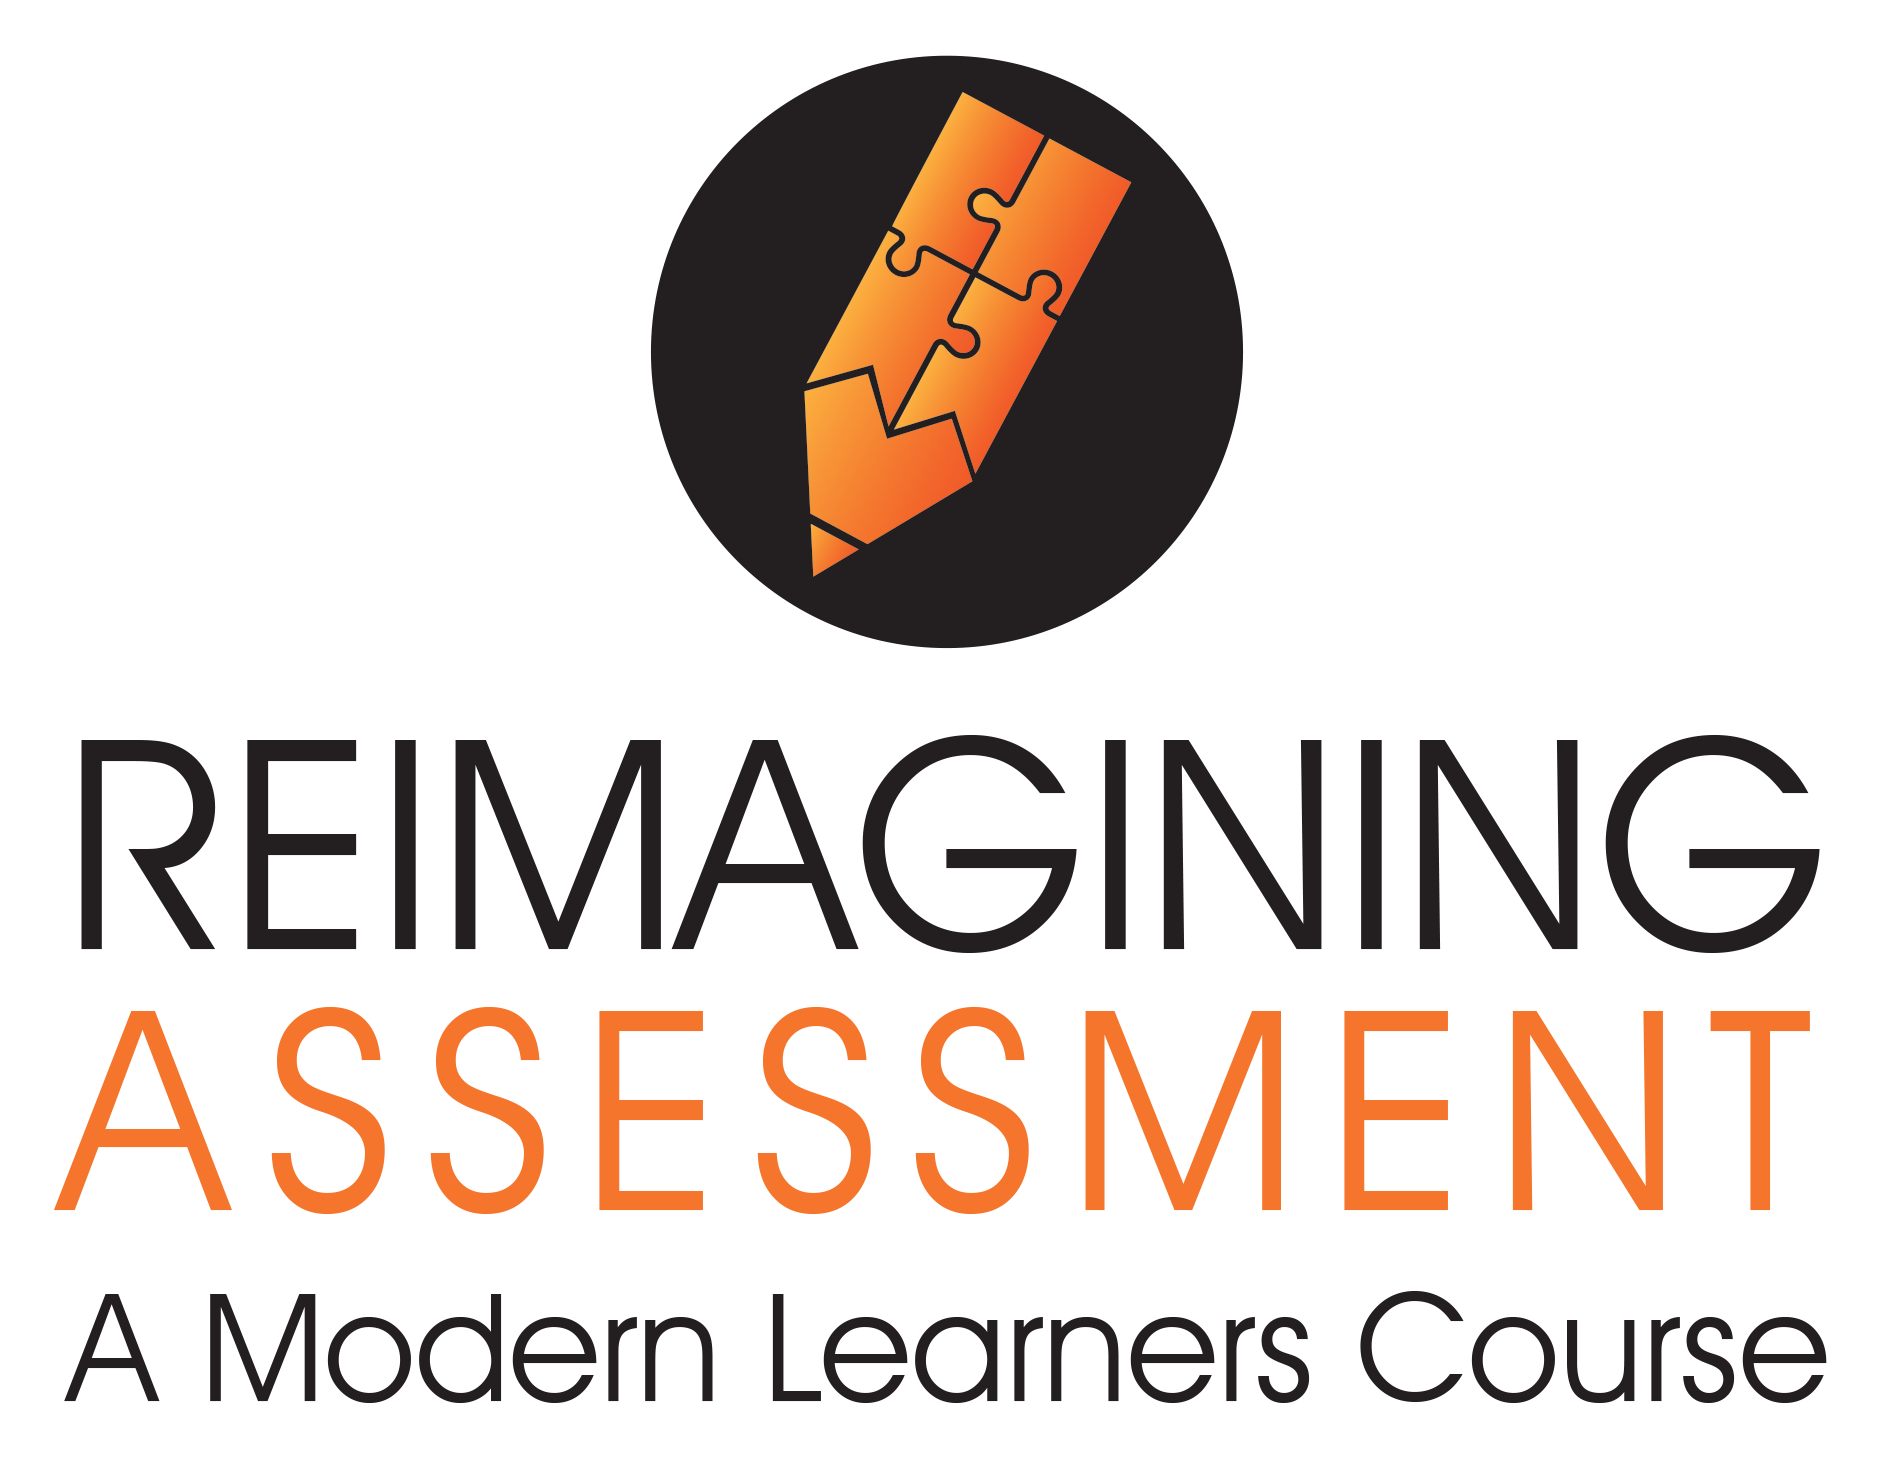 Reimagining-assessment-course logo